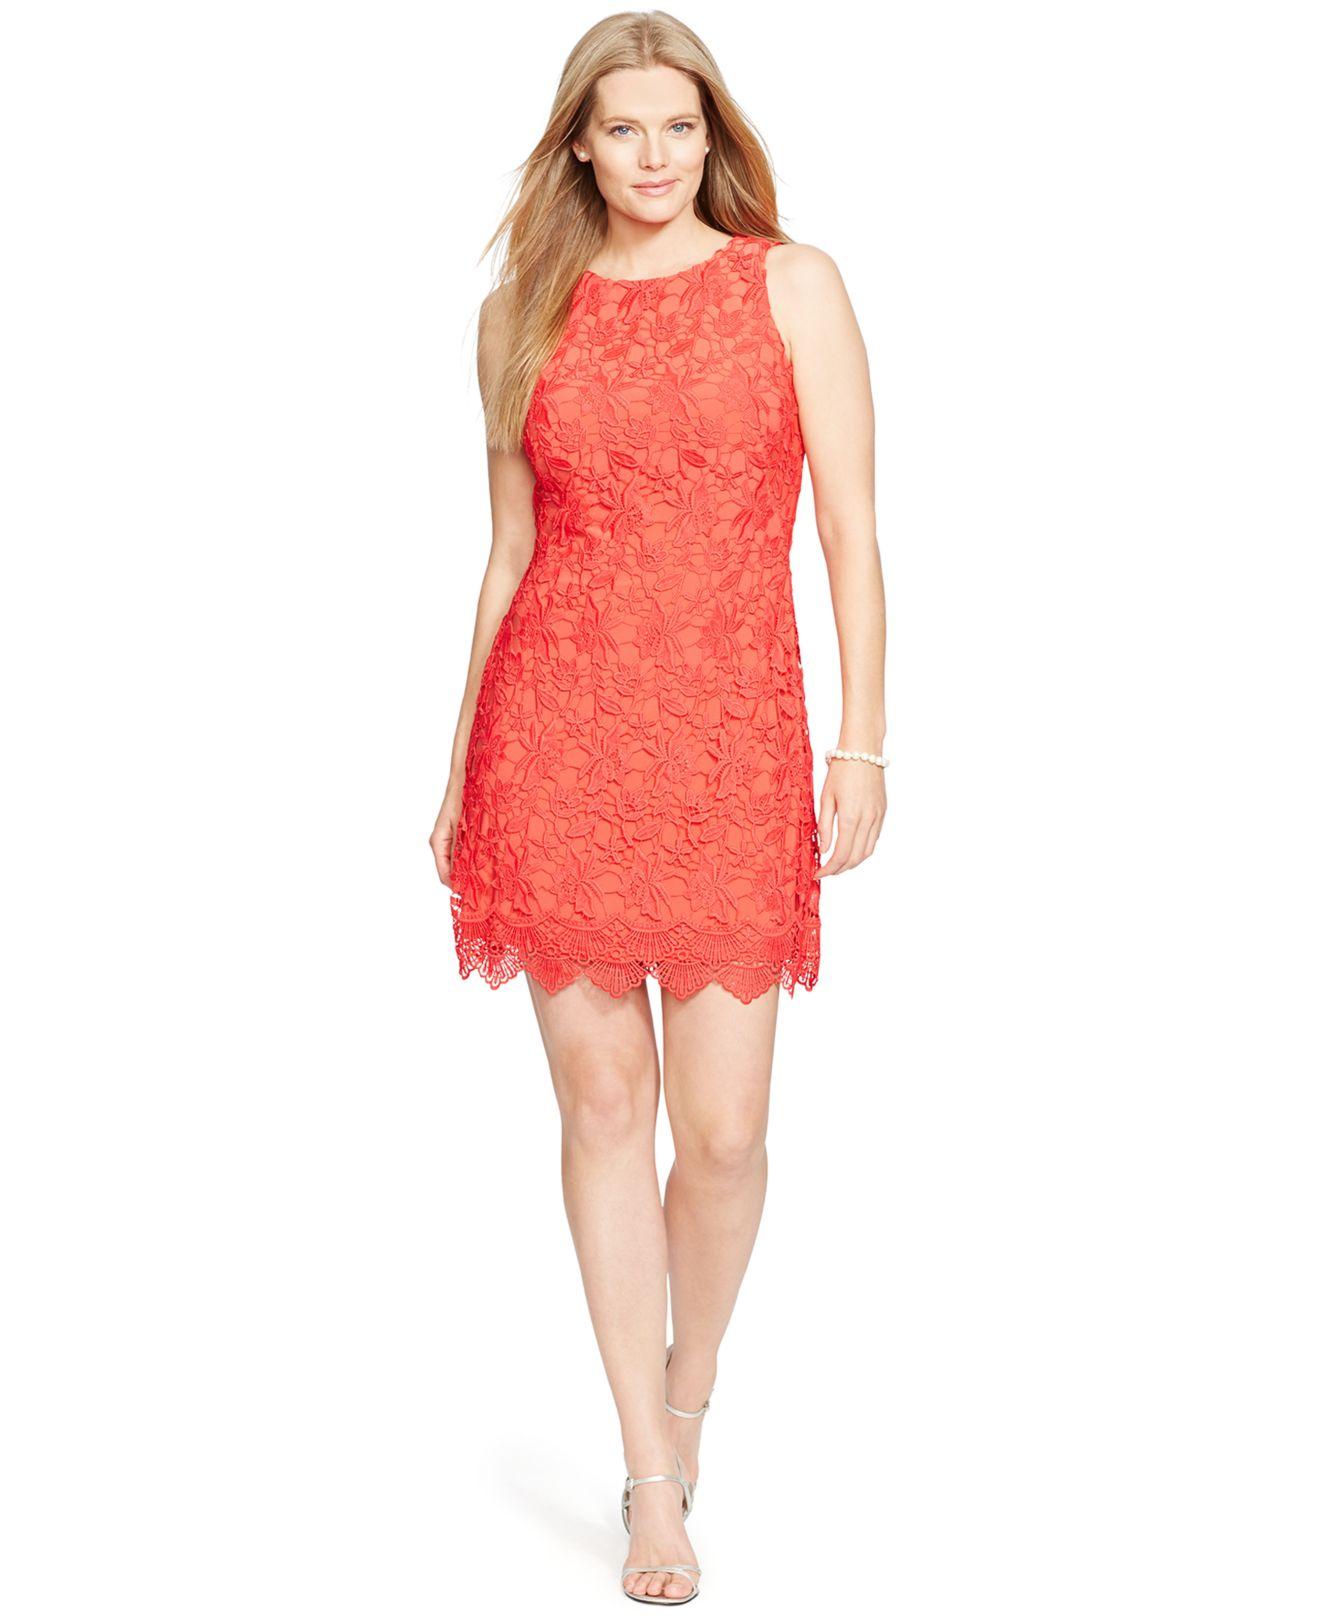 Lyst - Lauren by ralph lauren Plus Size Sleeveless Lace Dress in Red